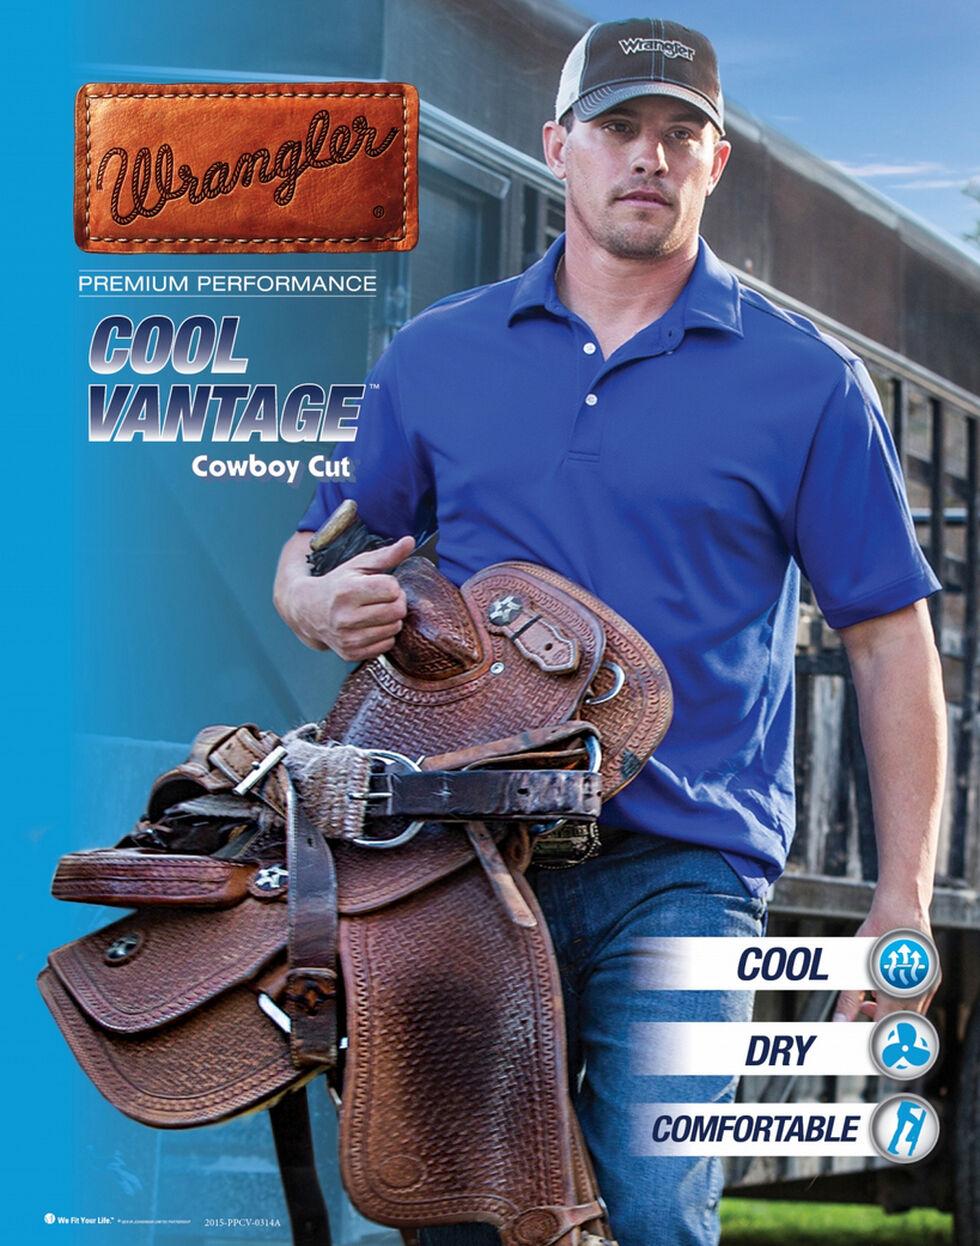 Wrangler Men's 20X Cool Vantage Competition Slim Jeans - Storm Blue, Denim, hi-res